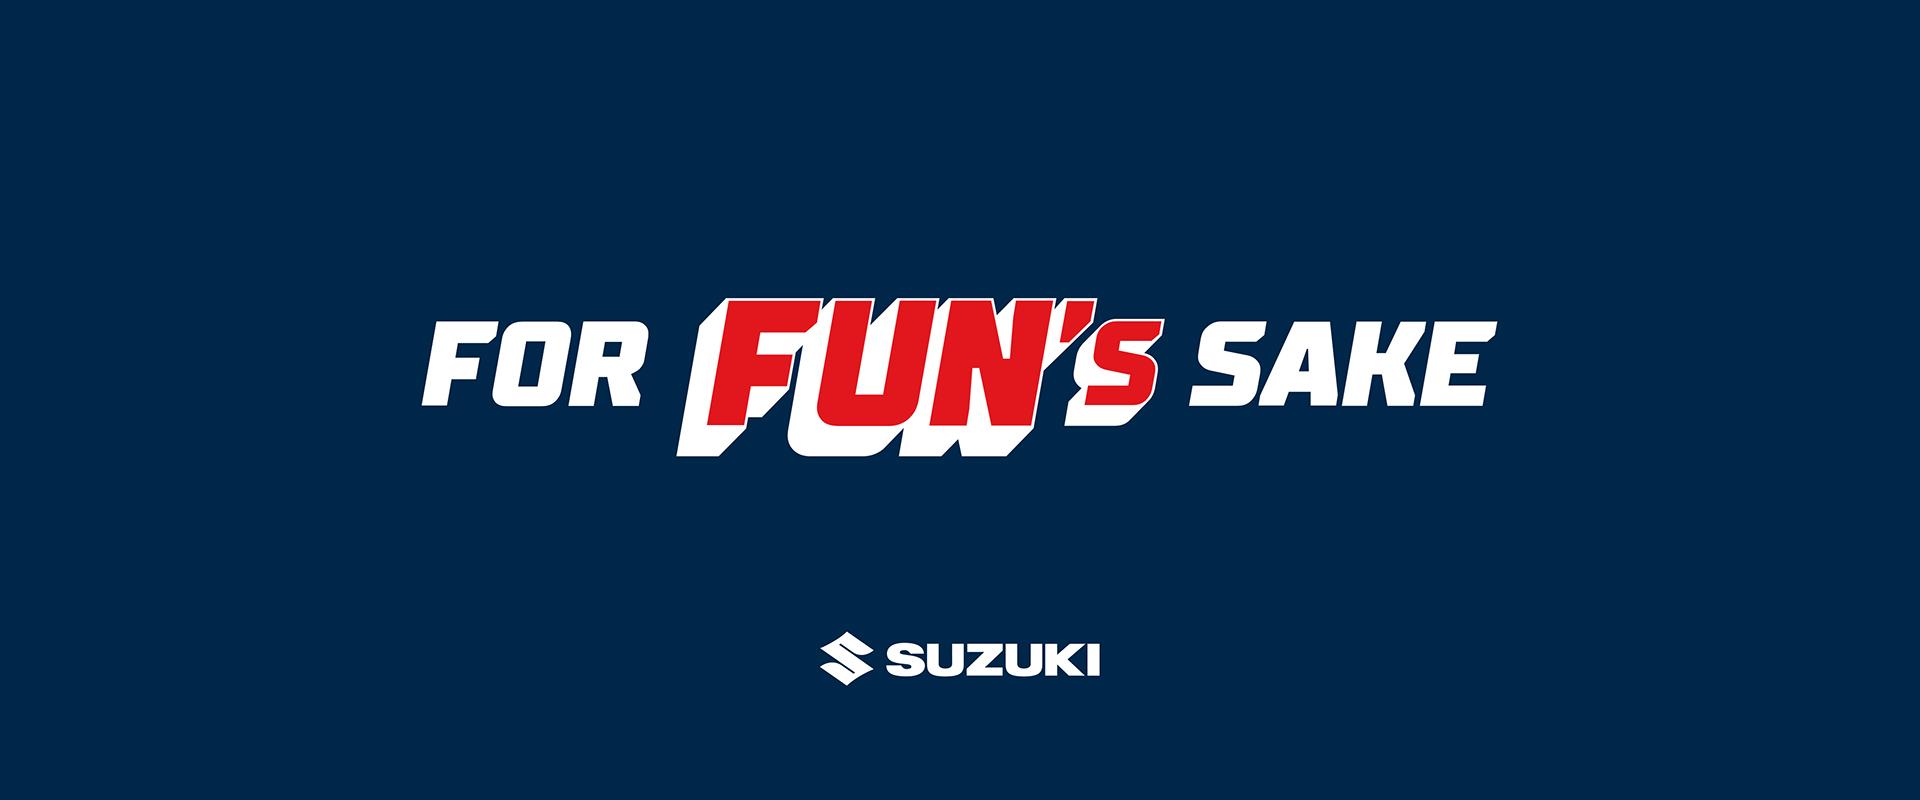 Suzuki - For Funs Sake